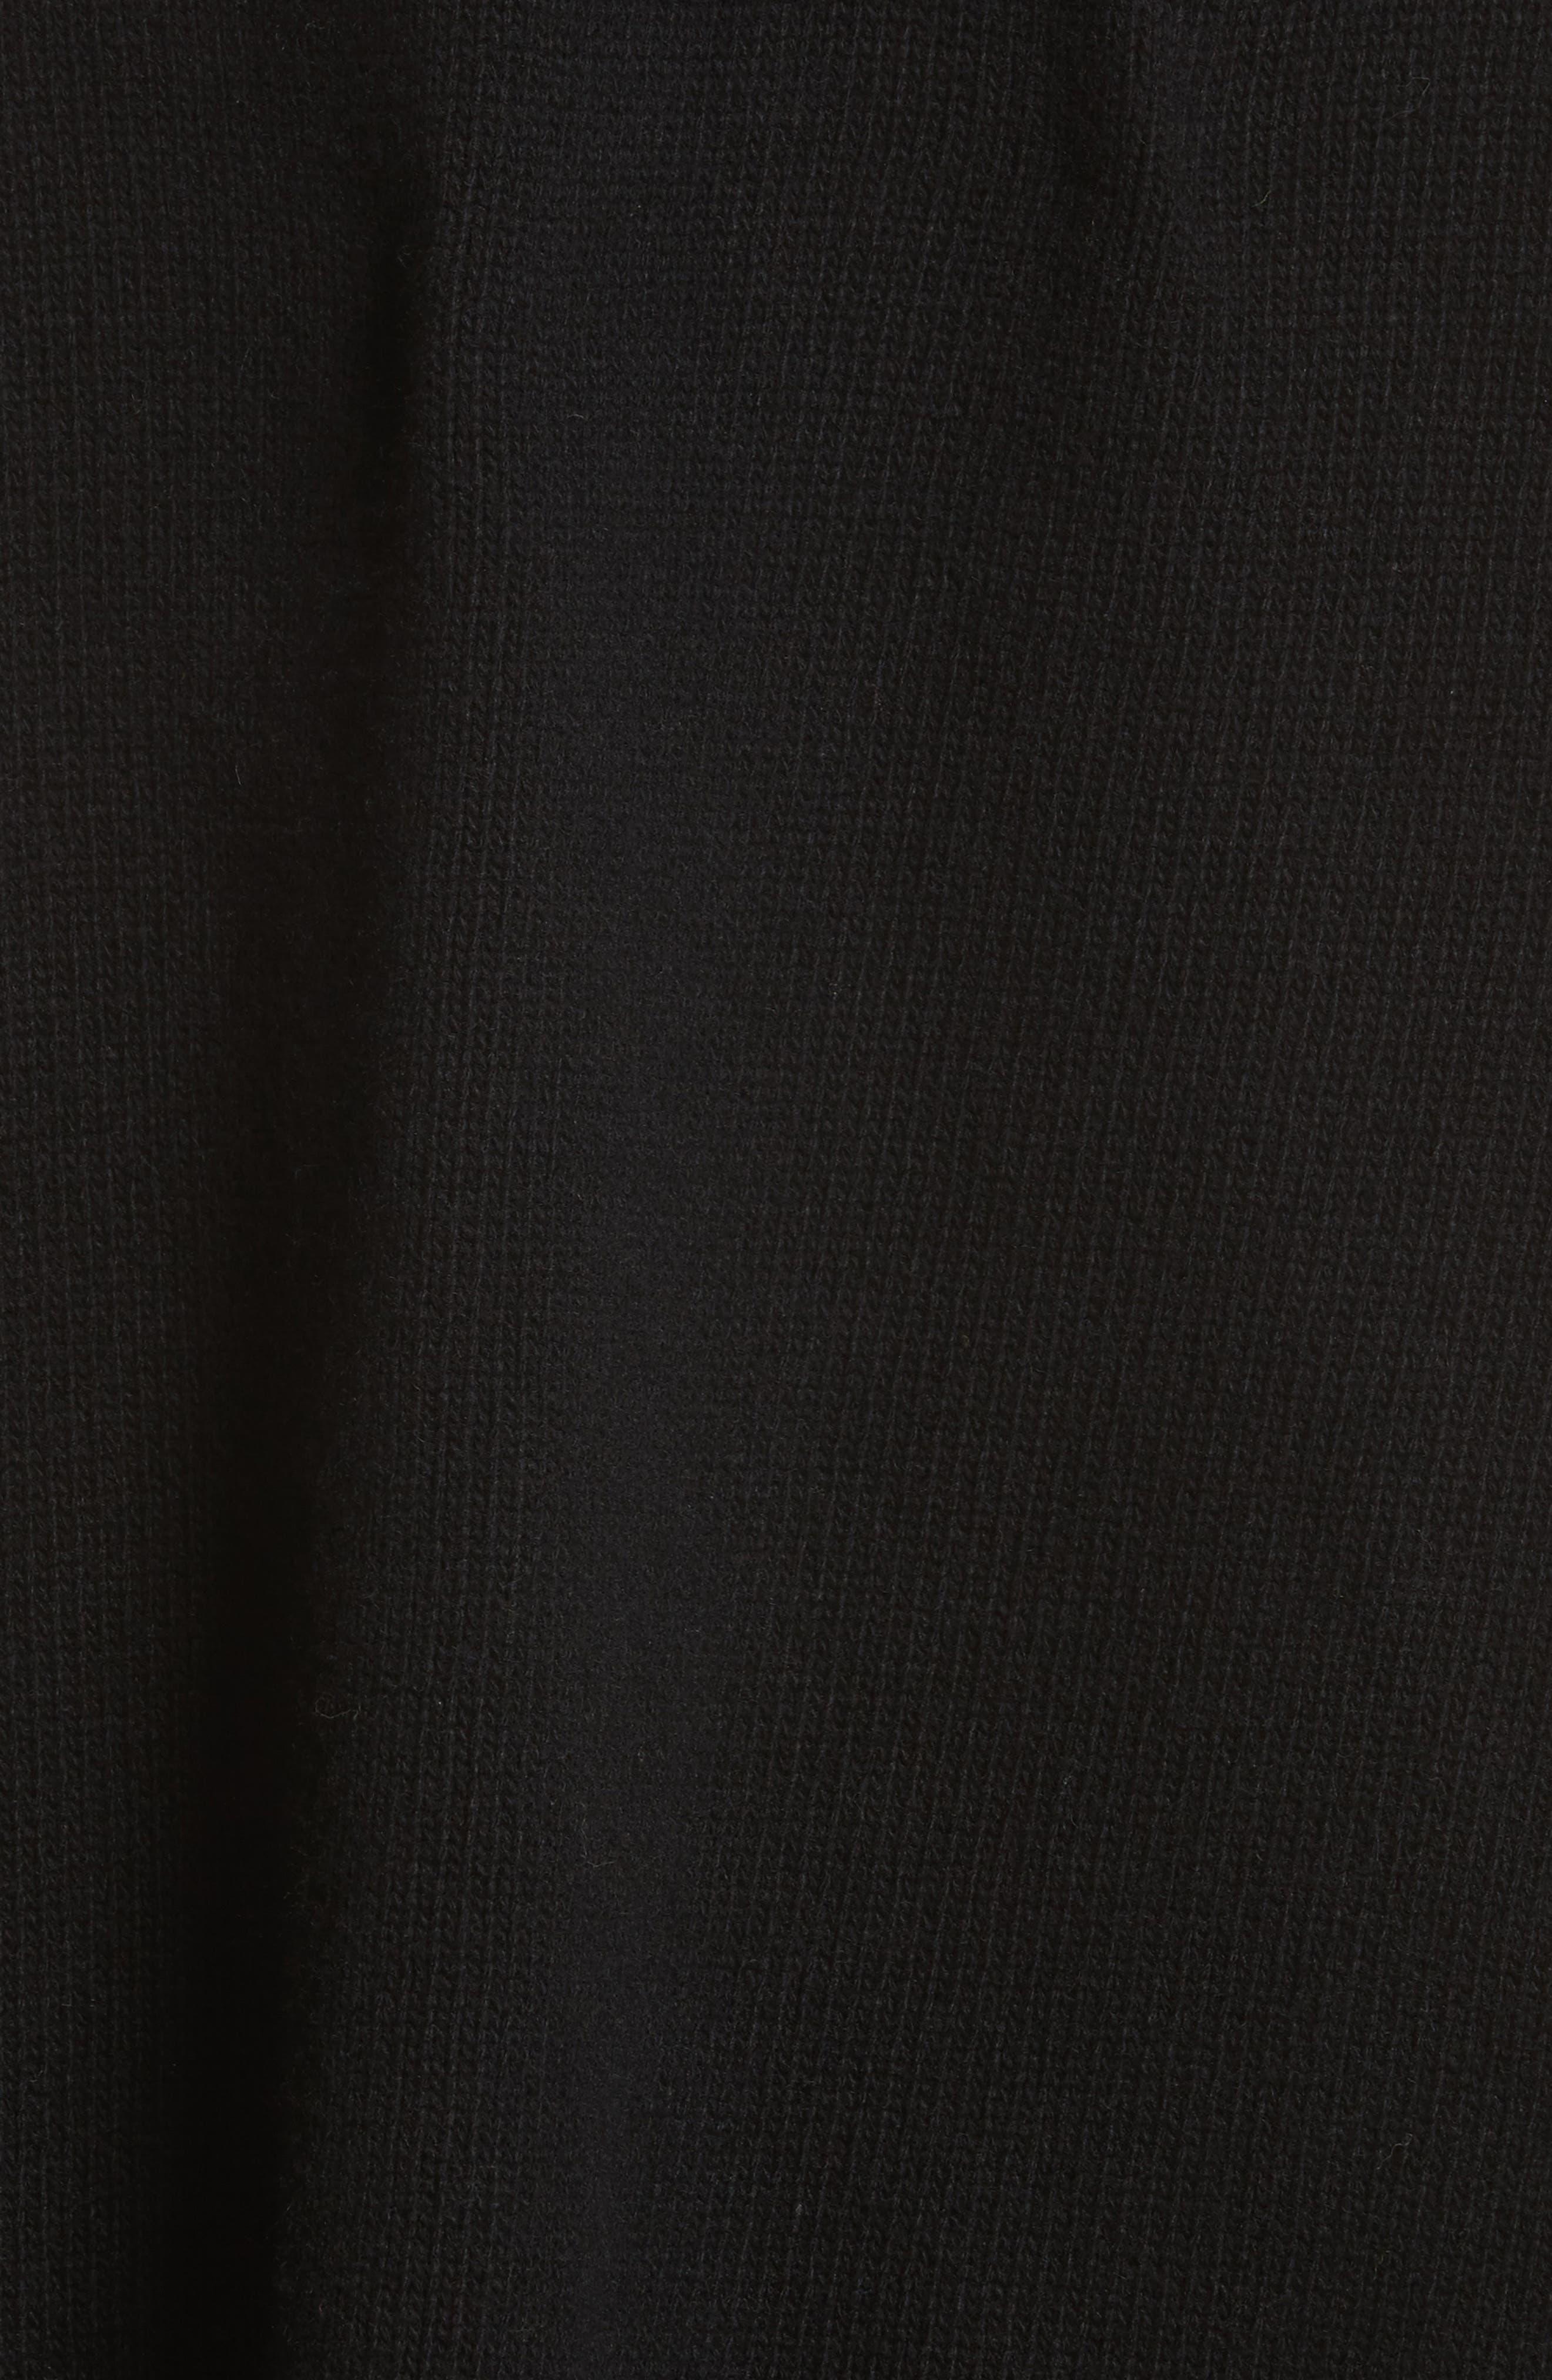 Star Turtleneck Sweater,                             Alternate thumbnail 5, color,                             001